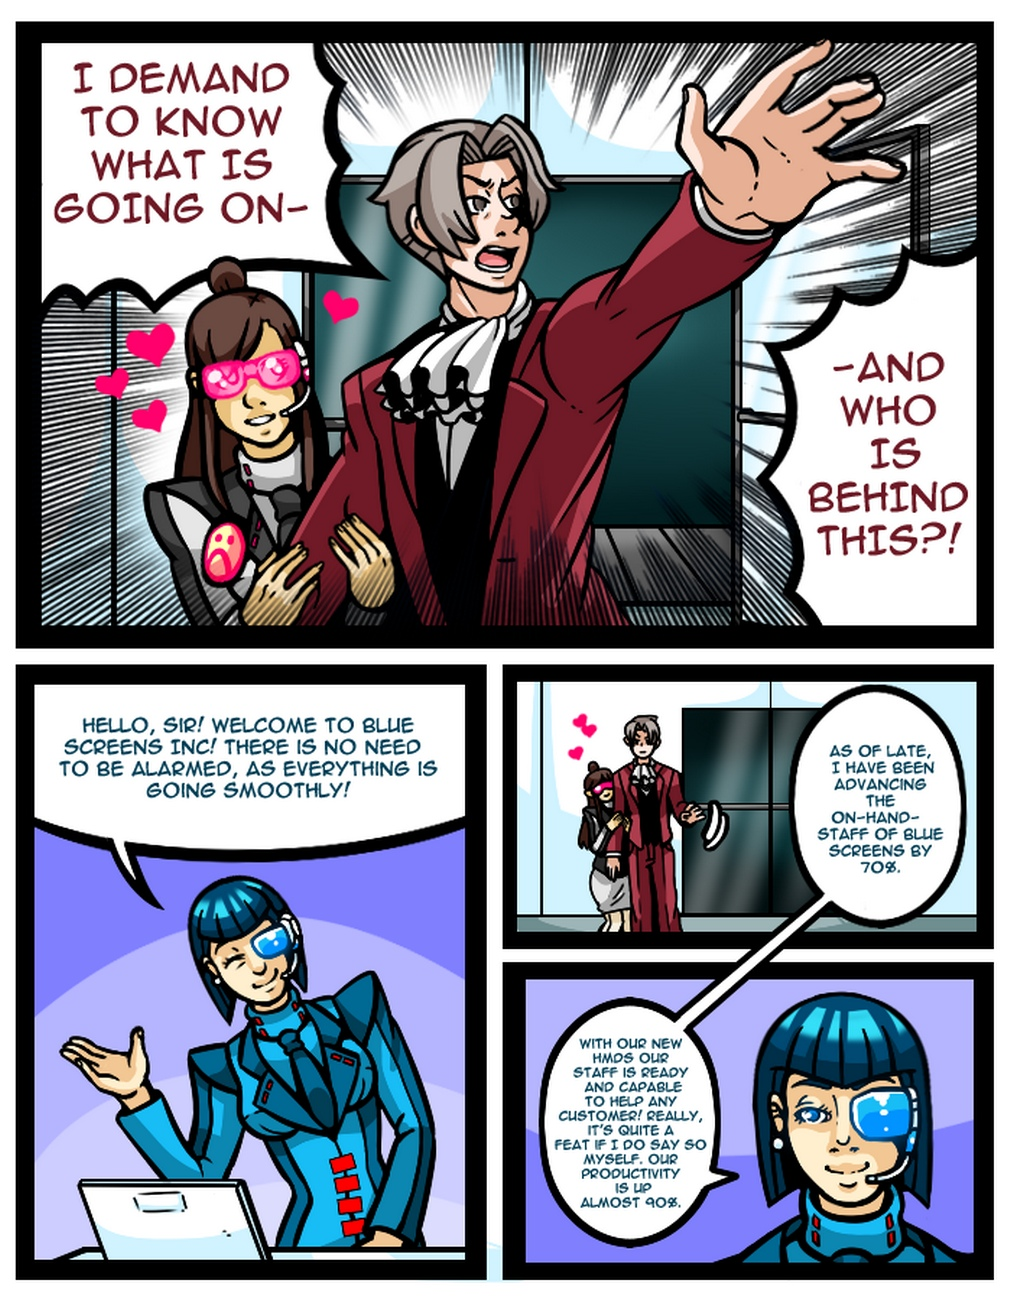 Blue-Screens-s-HMD-2 5 free sex comic